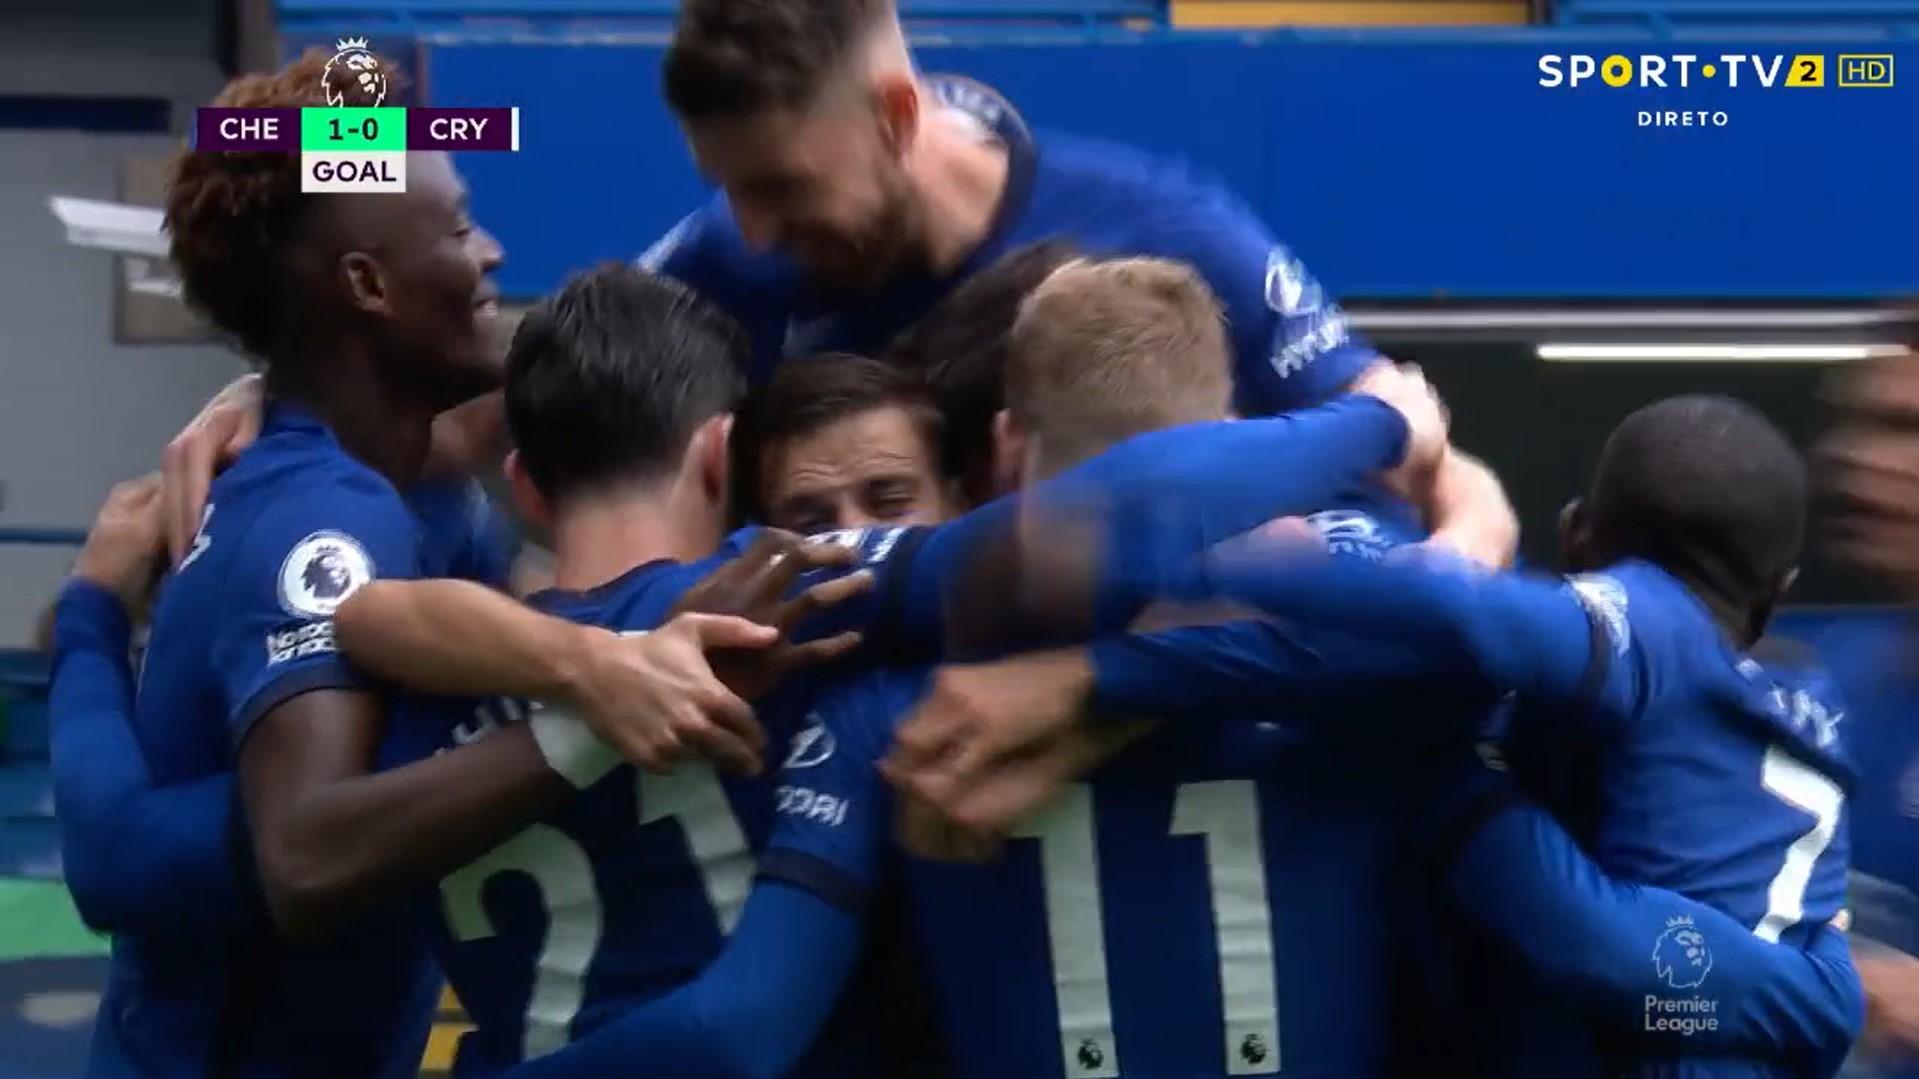 Premier League (4ª Jornada): Resumo Chelsea 4-0 Crystal Palace